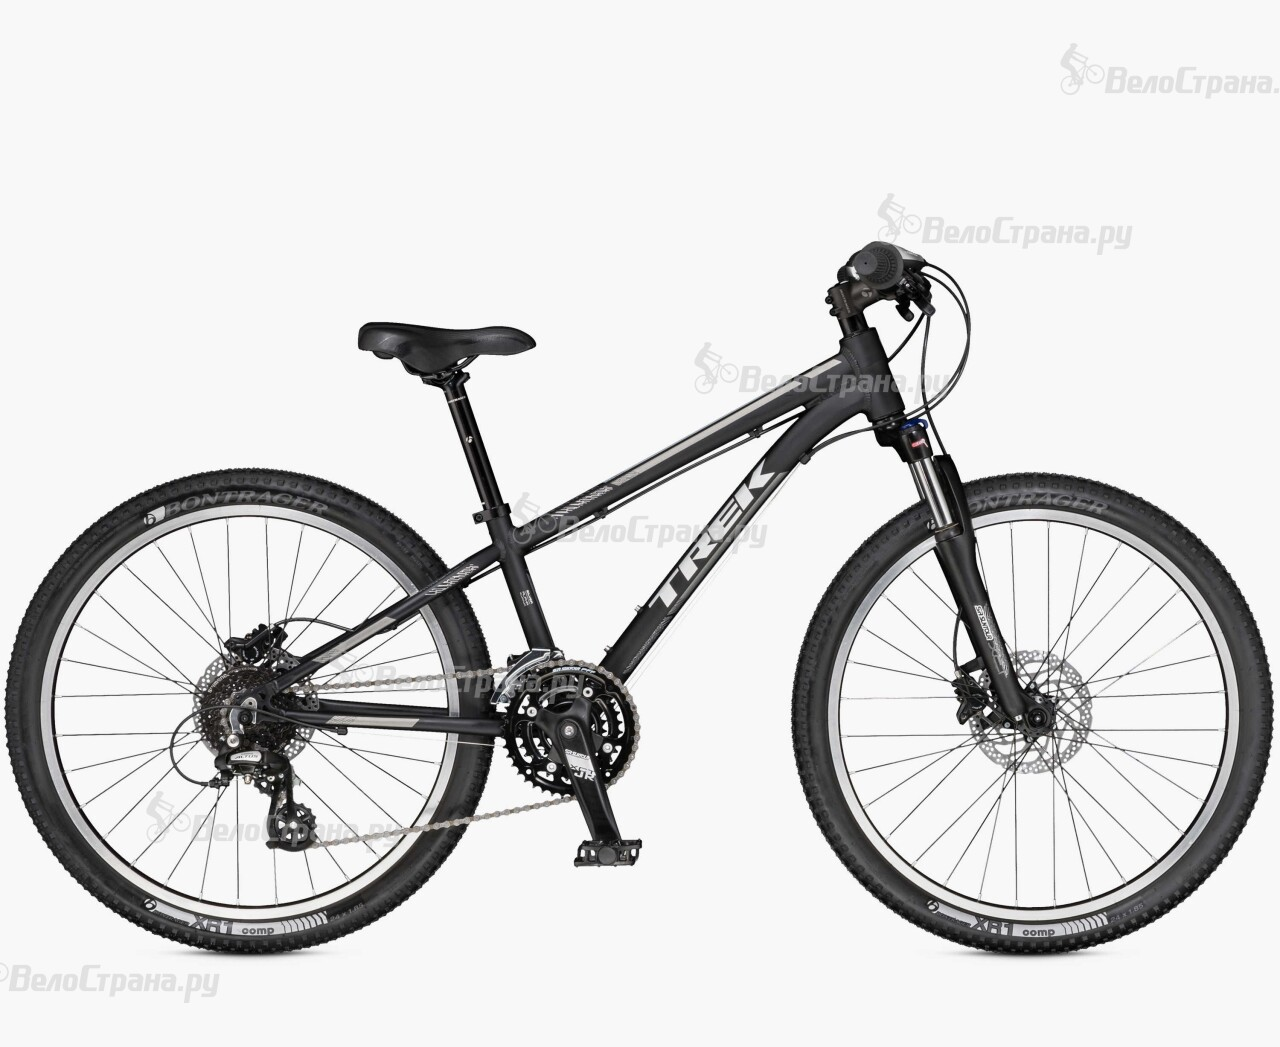 Велосипед Trek Superfly 24 Disc (2016) sadat khattab usama abdul raouf and tsutomu kodaki bio ethanol for future from woody biomass